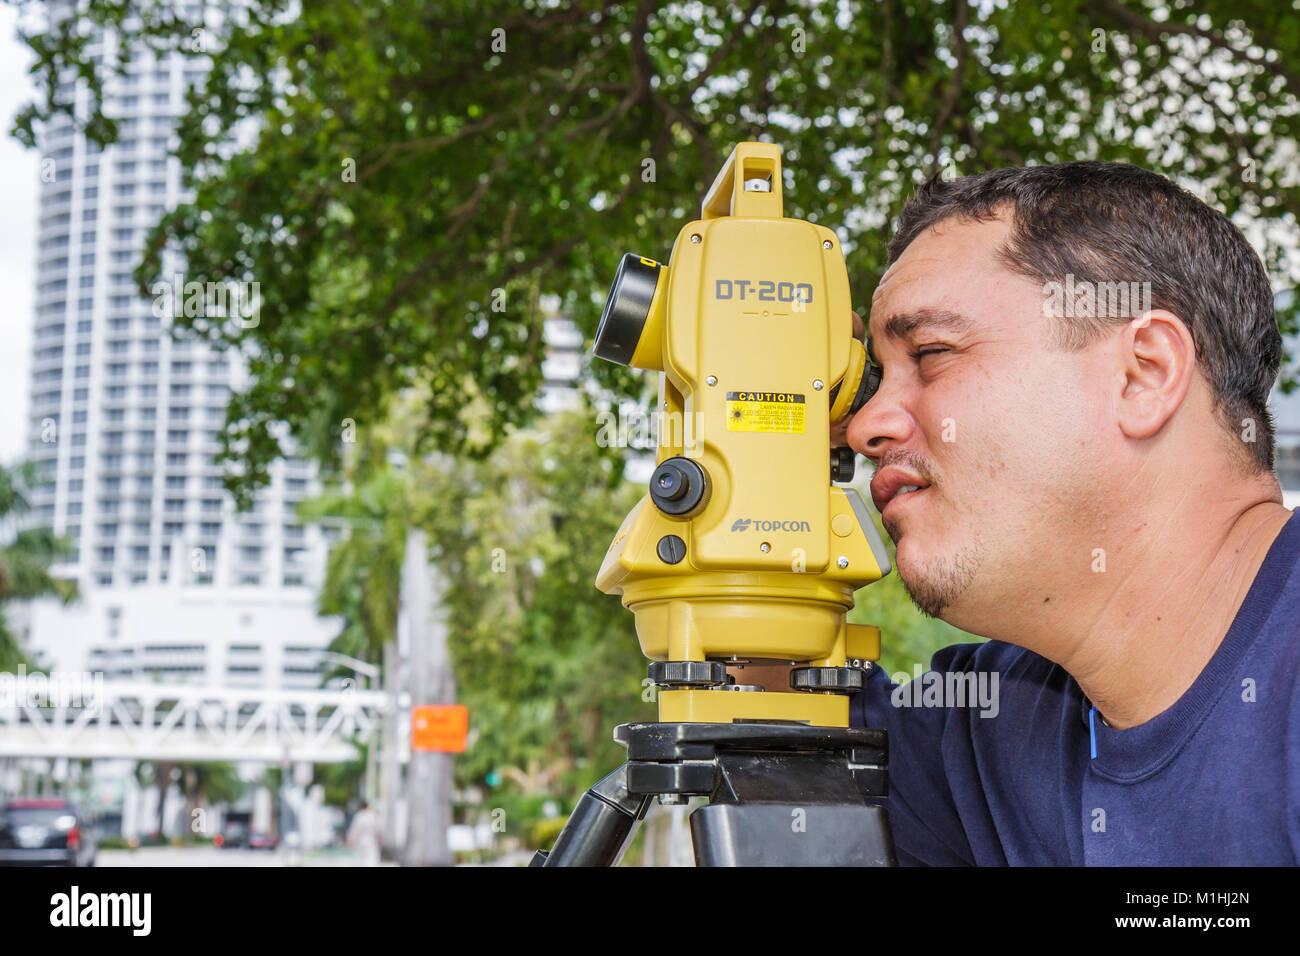 Miami Florida theodolite measures angles Hispanic man survey Topcon job skill construction - Stock Image